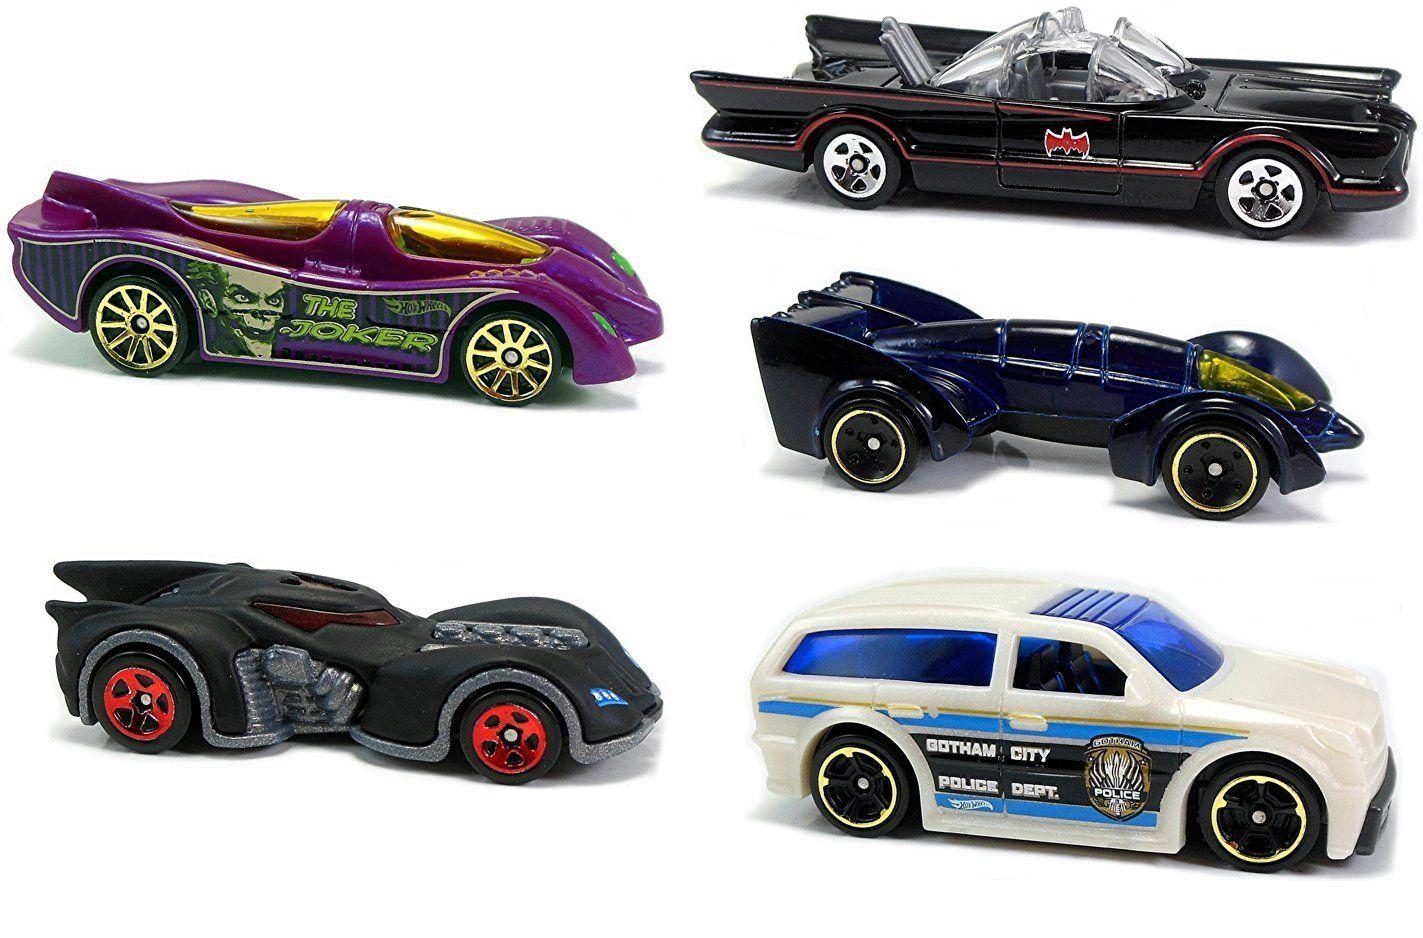 Batman Hot Wheels 5pack Tv Series Batmobile Joker Car Gotham